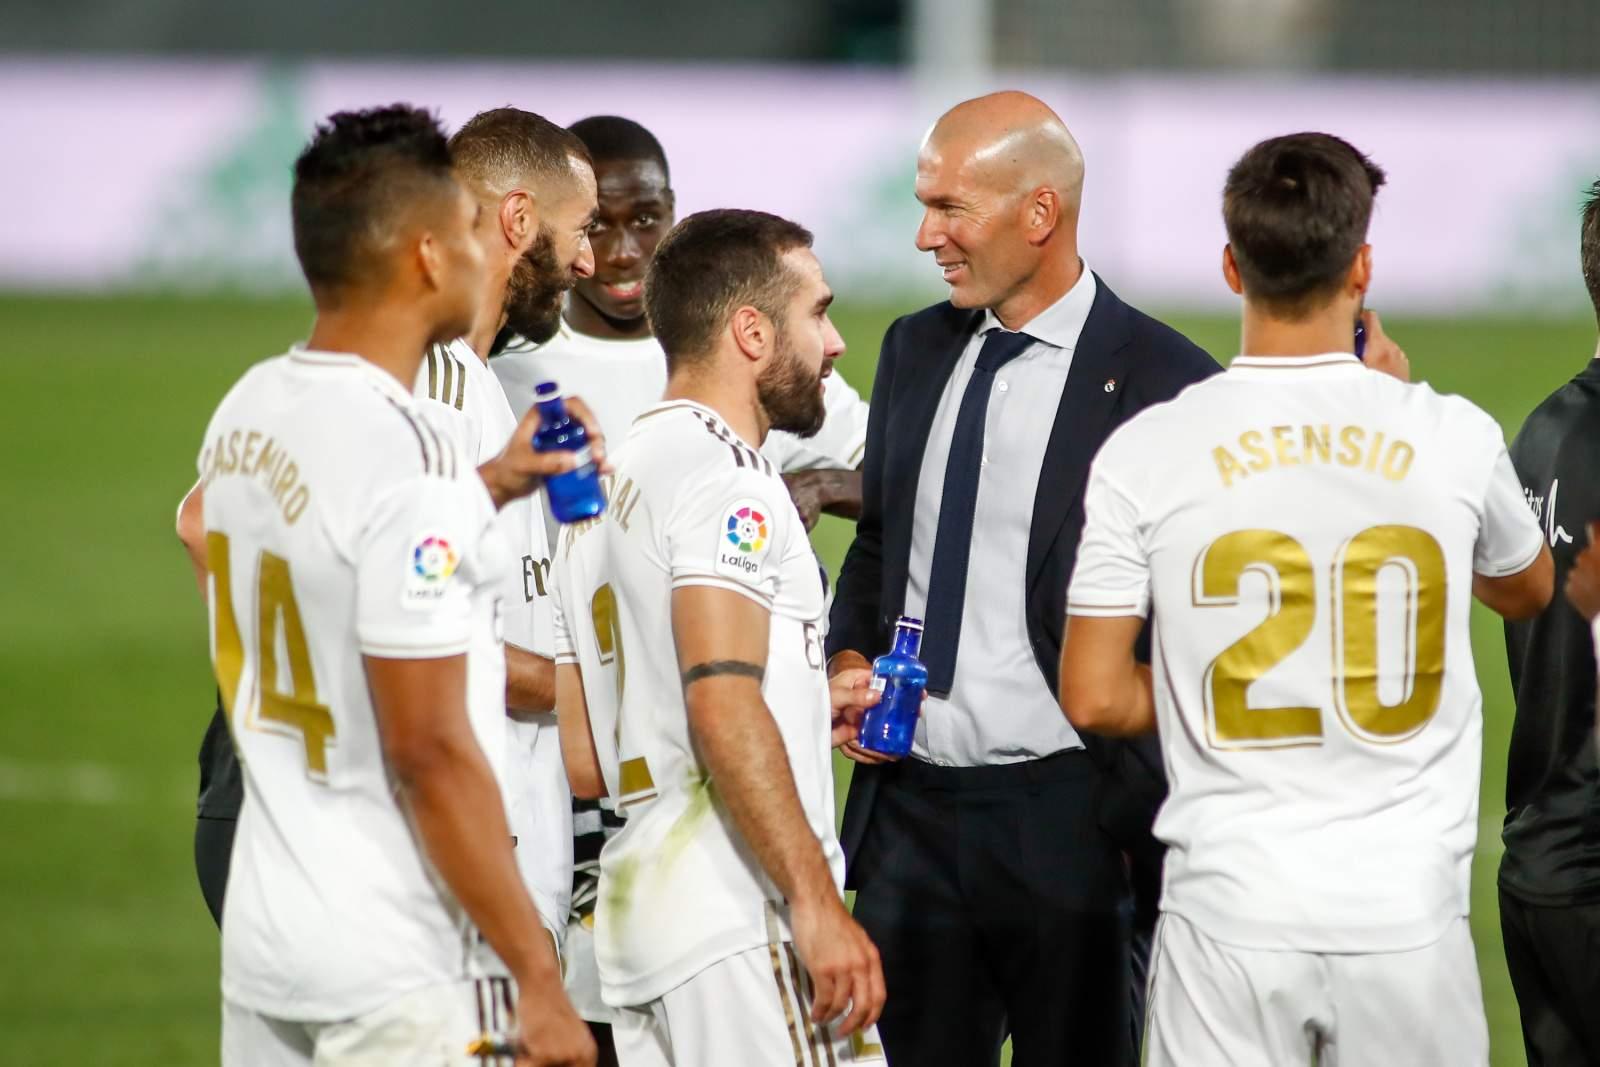 «Реал» - «Бетис» - 0:0 (завершён)